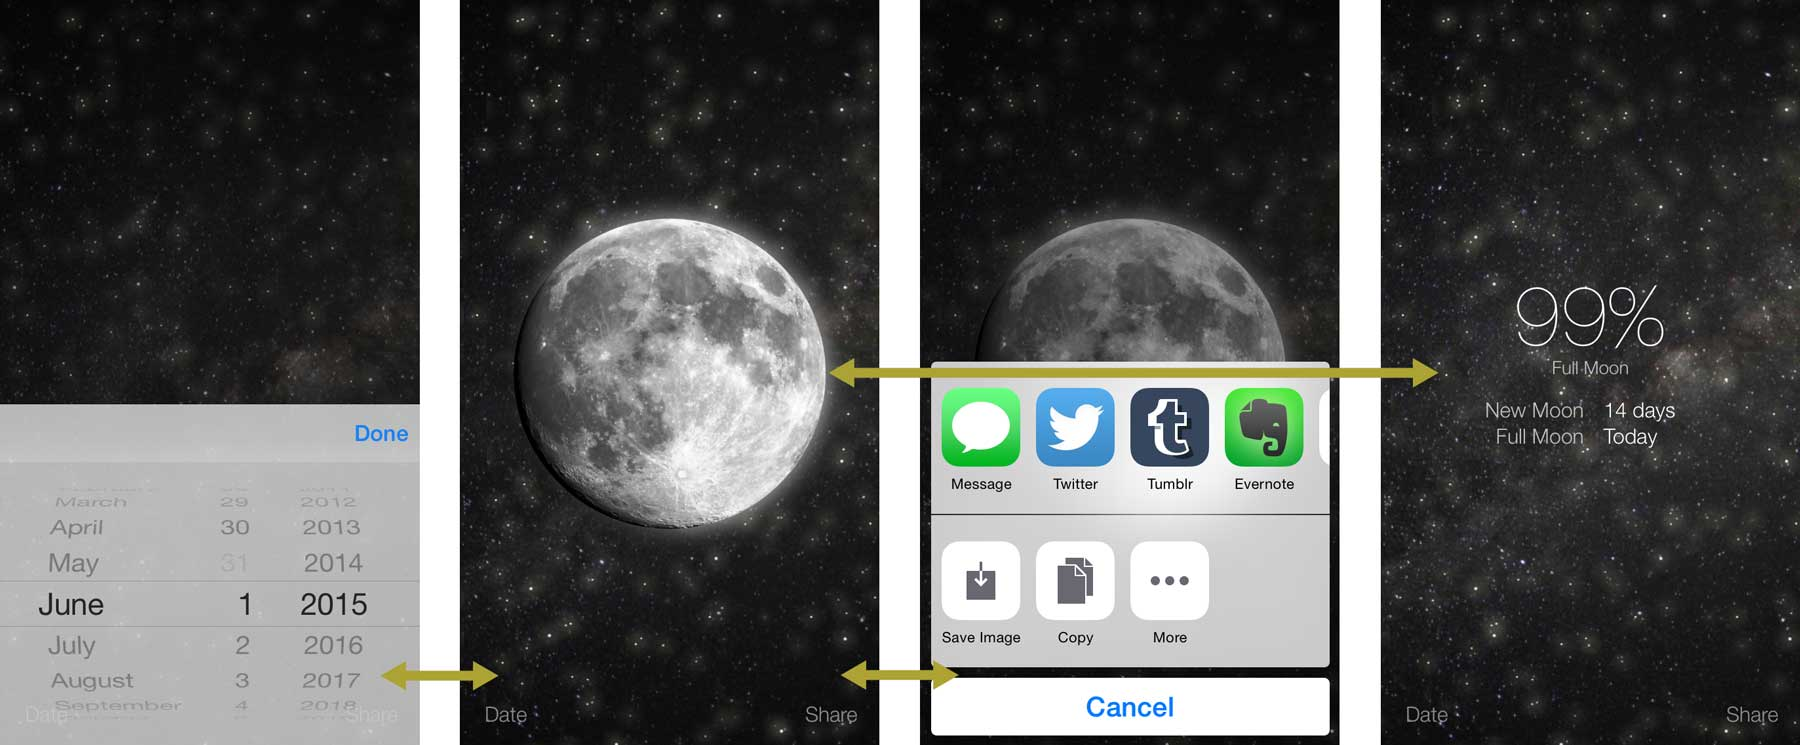 moon phase app screenshot iOS iphone